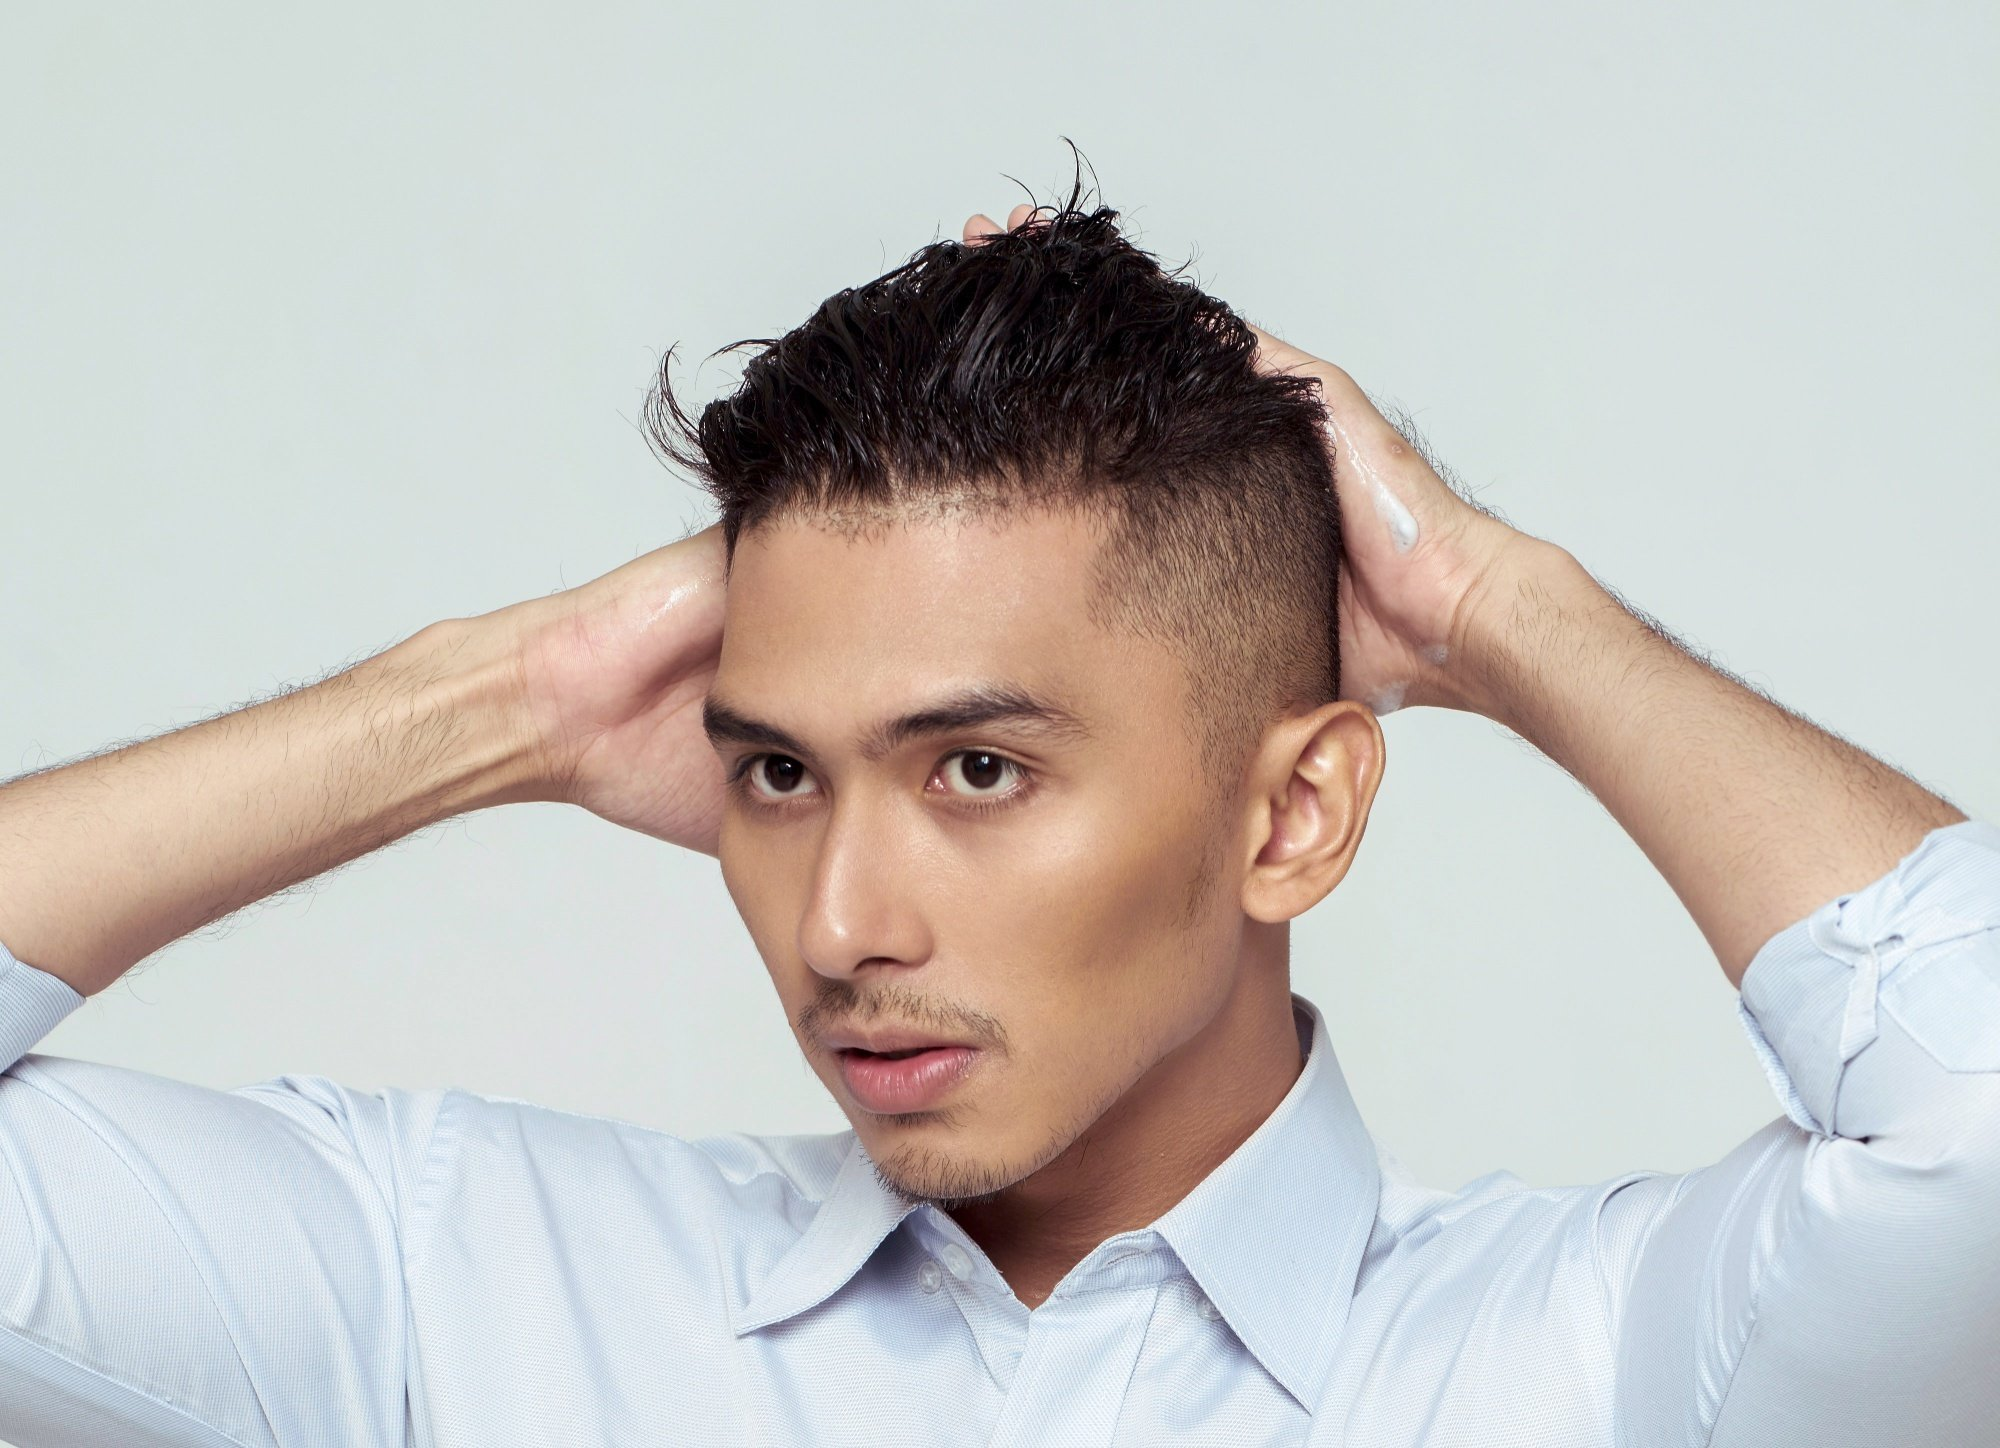 Scalp care men: Closeup shot of an Asian man massaging his scalp